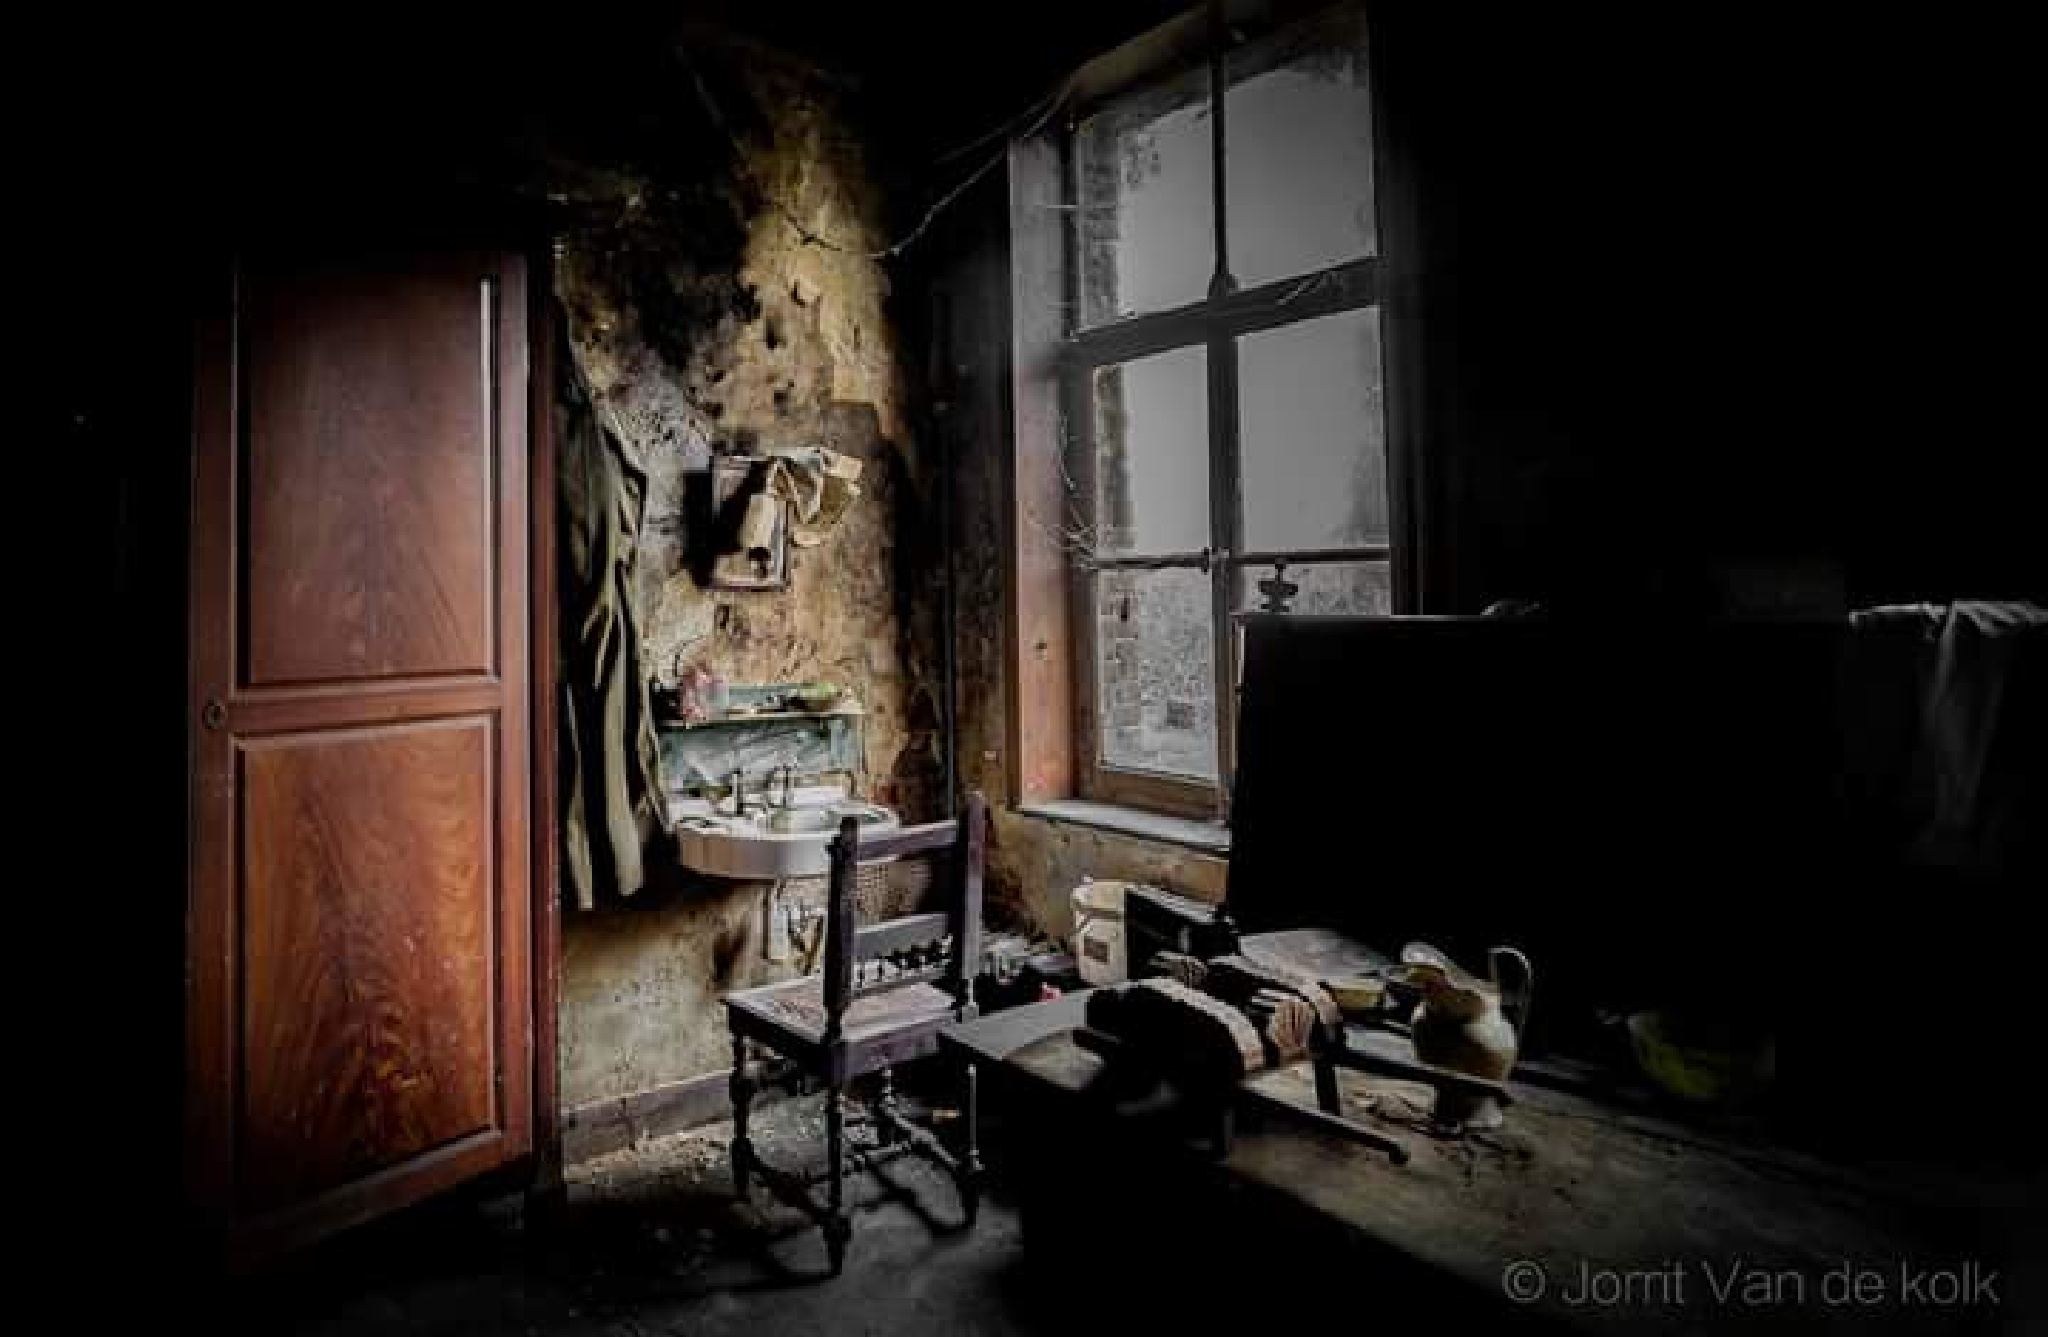 abandoned house with nice decay ... by Jorrit van de kolk